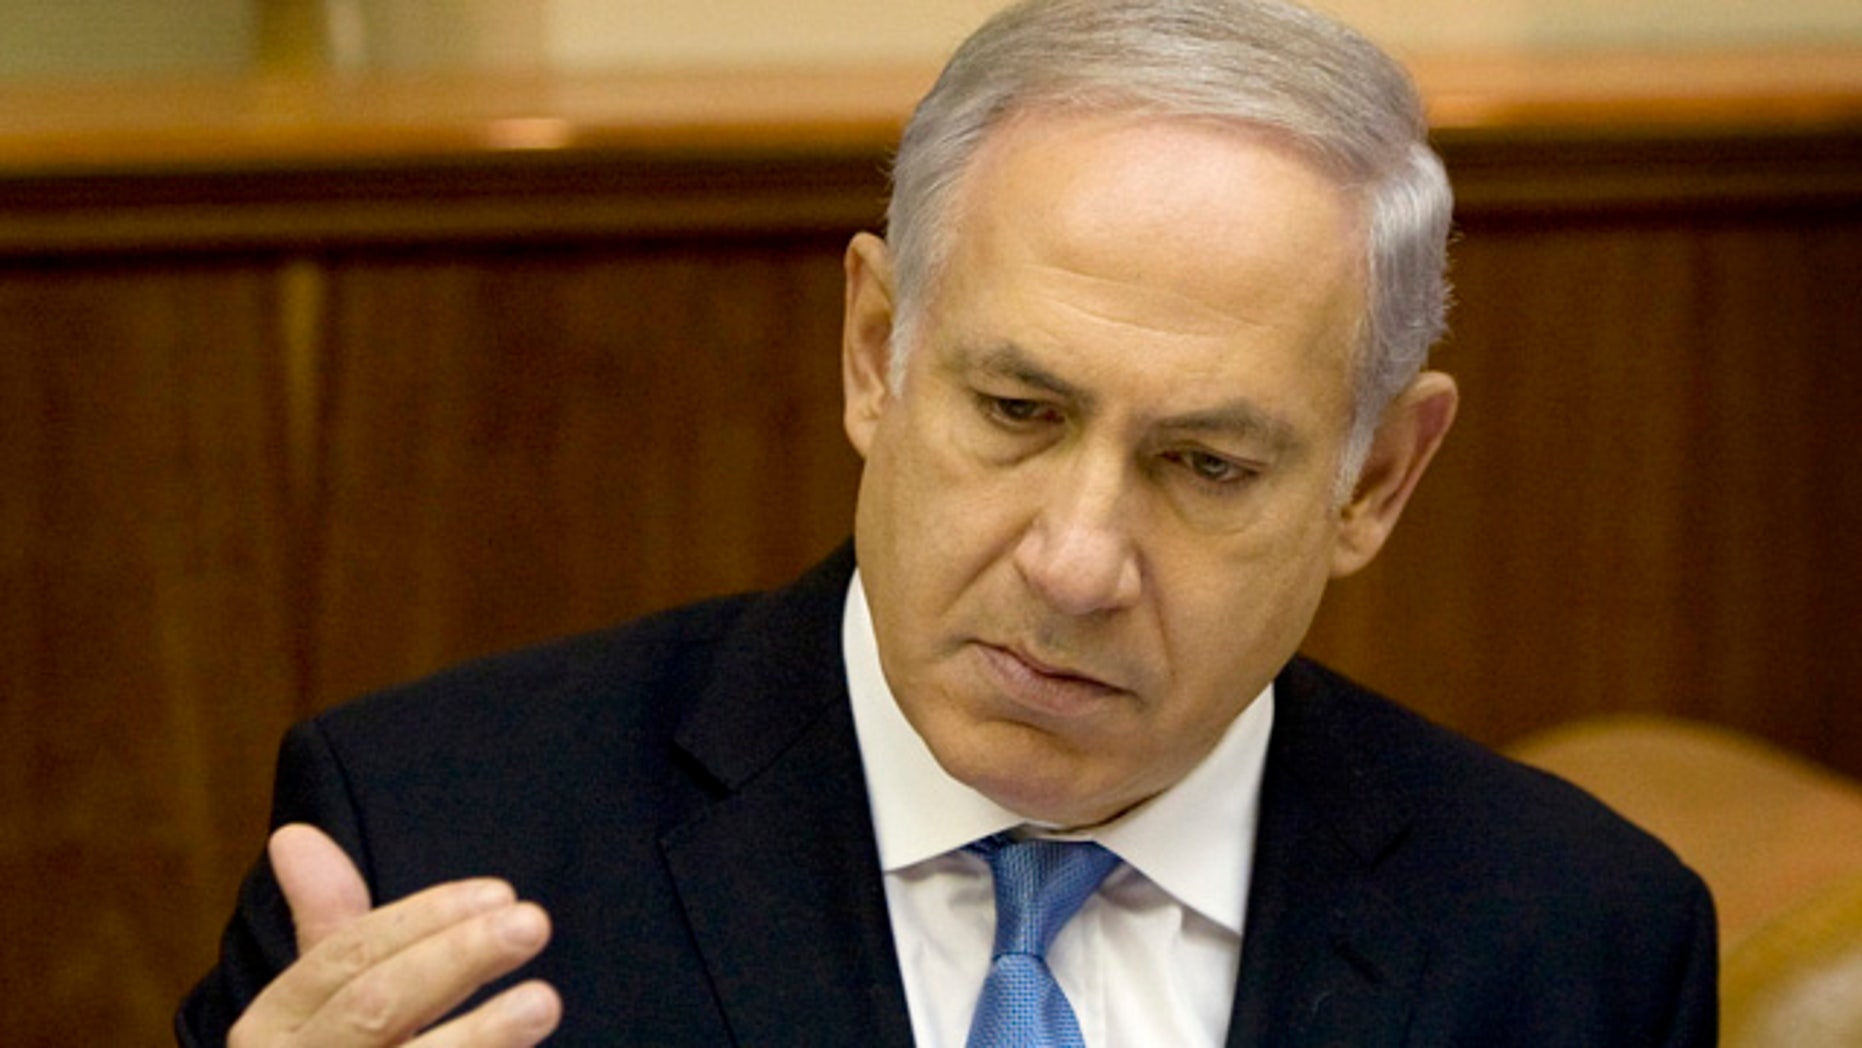 Aug. 1: Israeli Prime Minister Benjamin Netanyahu attends the weekly cabinet meeting in his Jerusalem office.